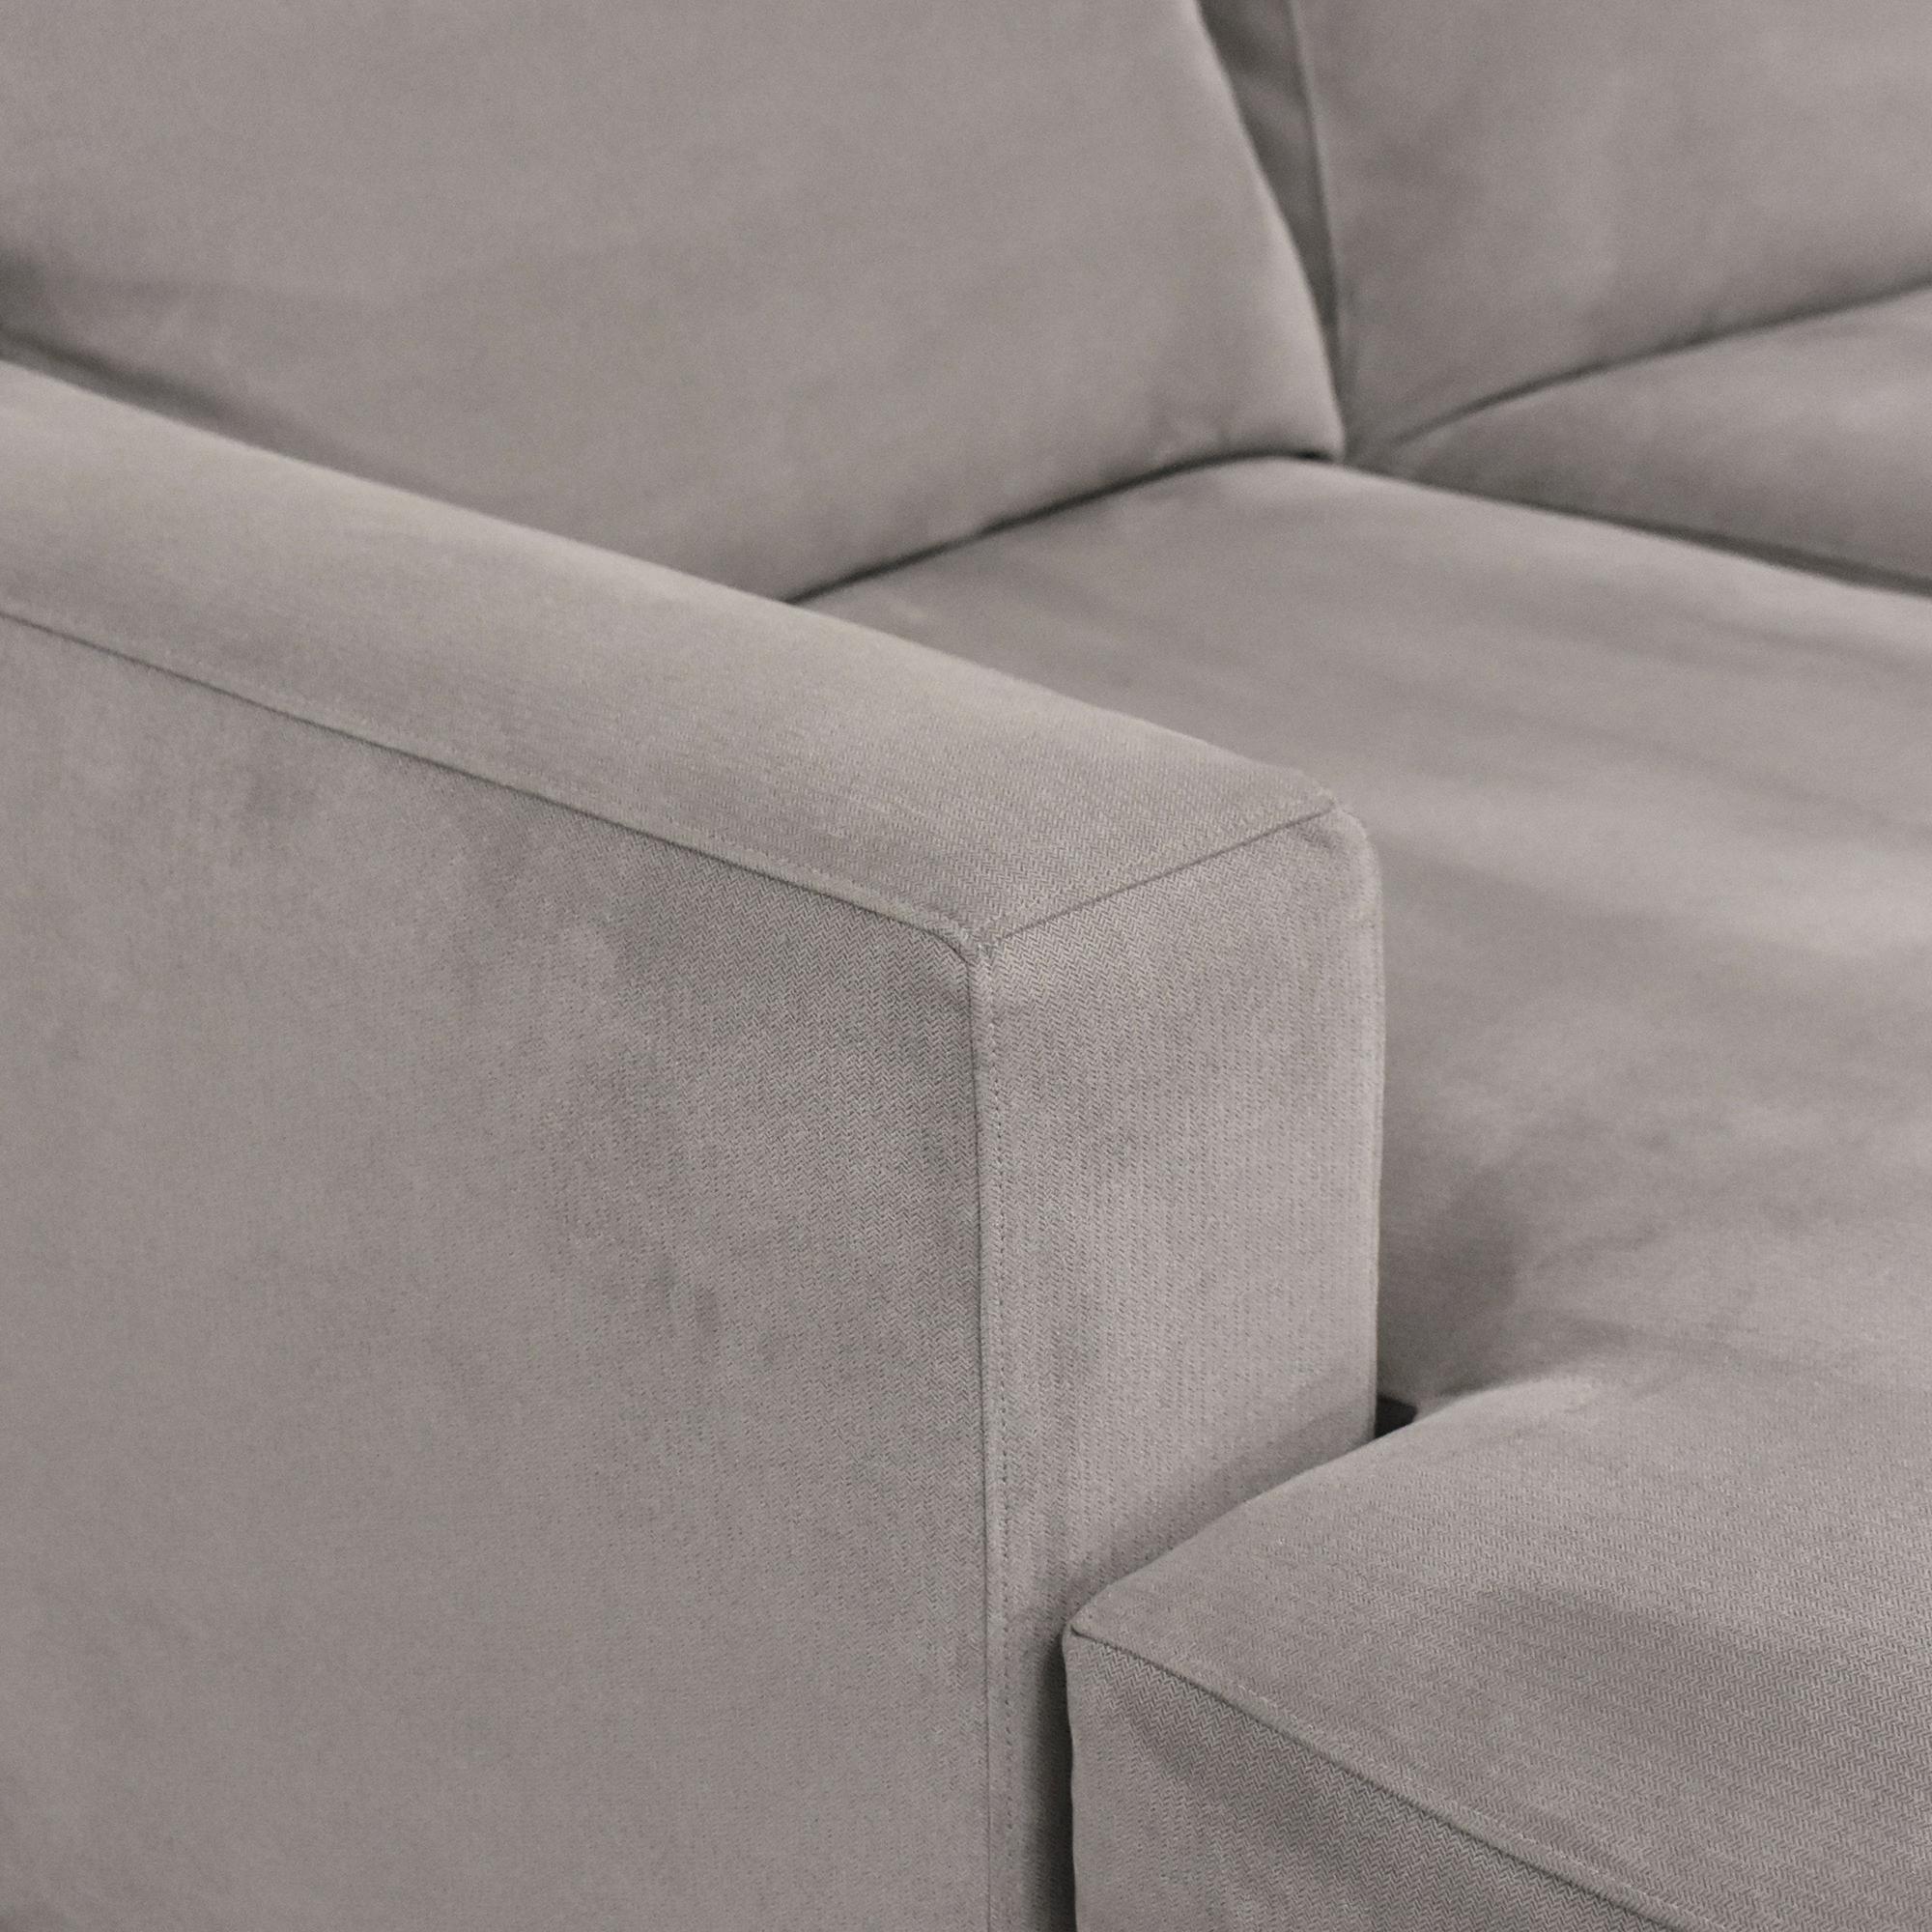 shop Crate & Barrel Crate & Barrel Axis II Two Piece Sectional Sofa online